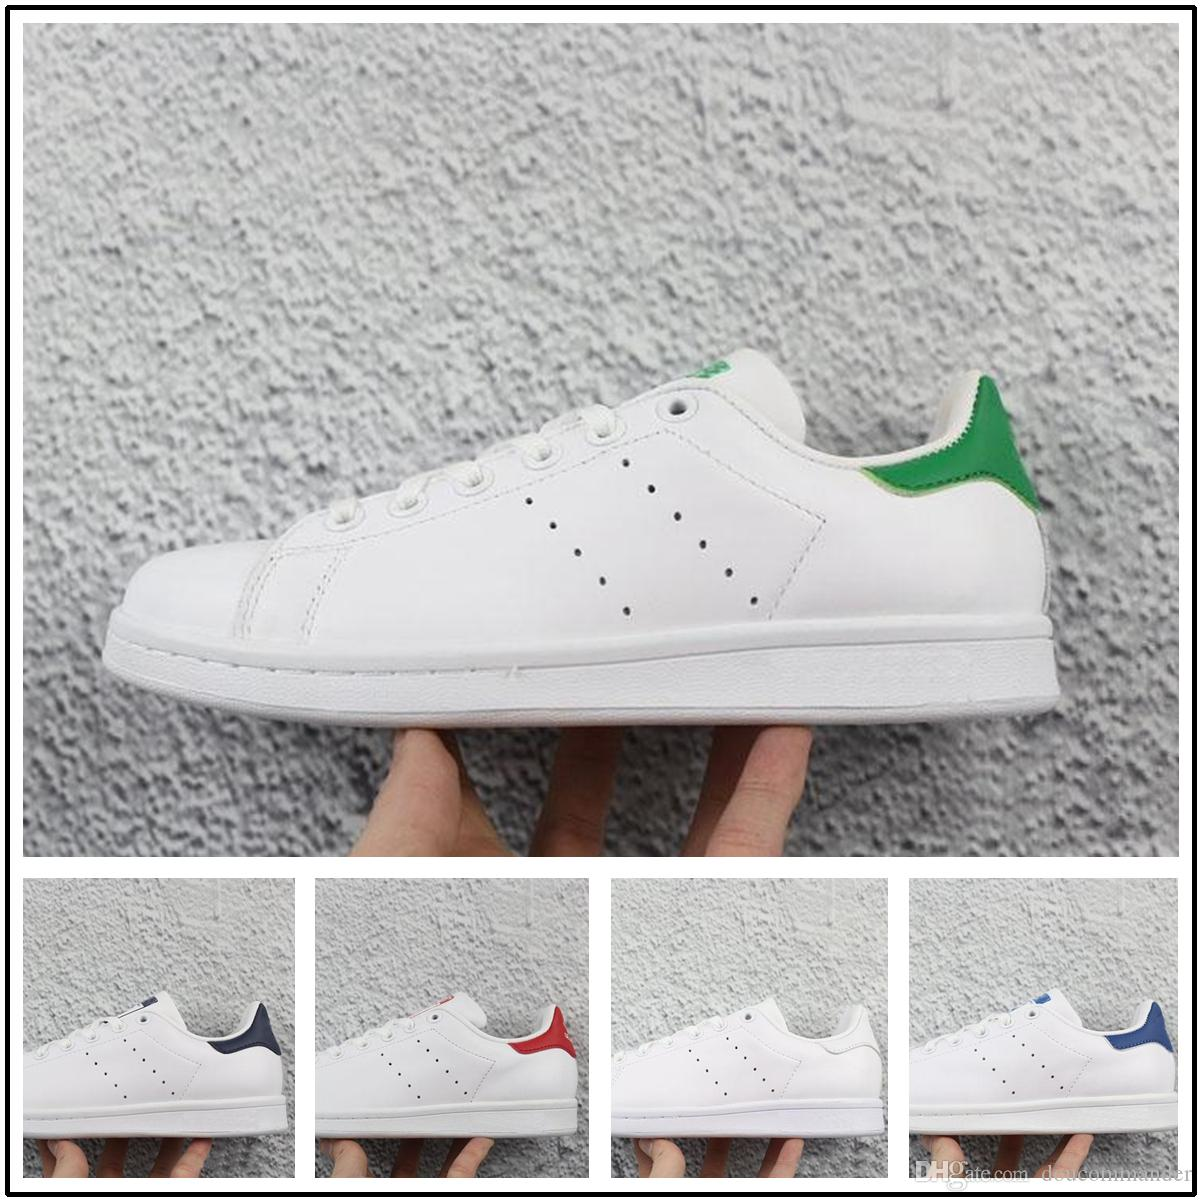 Acheter Adidas Superstar Chaussures Stan Smith 2018 Nouvelle Arrivée Pharrell Williams X Stan Smith Tennis HU Primeknit Hommes Femmes Casual